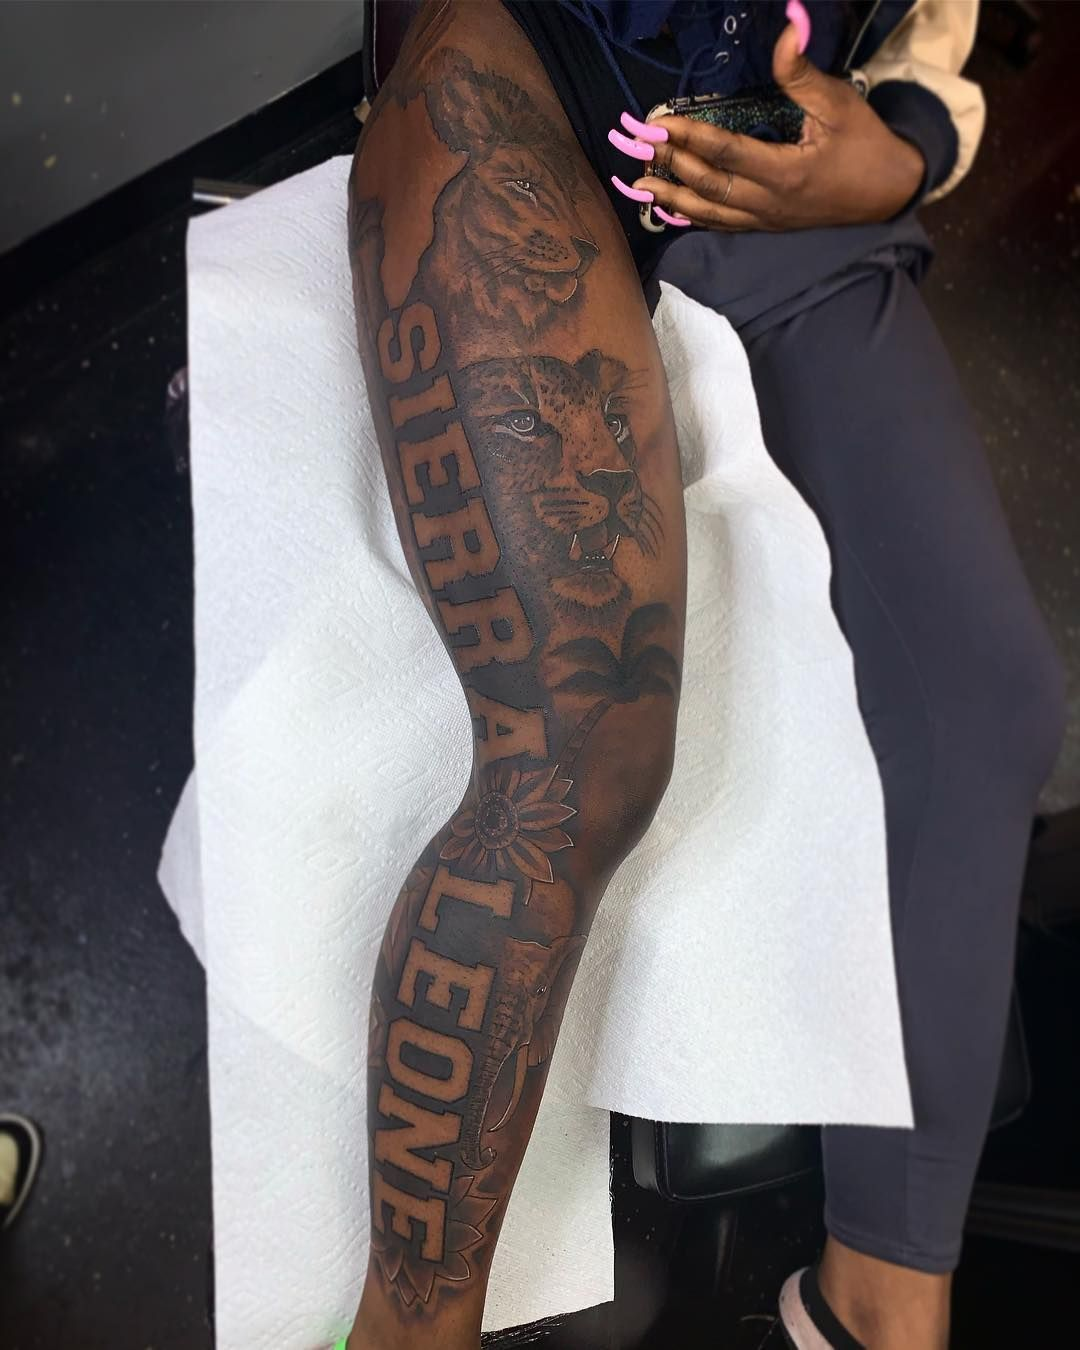 Tat Man Smush On Instagram Her 1st Tattoo Sat Like A Champ Session 2 Complete Girl Leg Tattoos Black Girls With Tattoos Dark Skin Tattoo